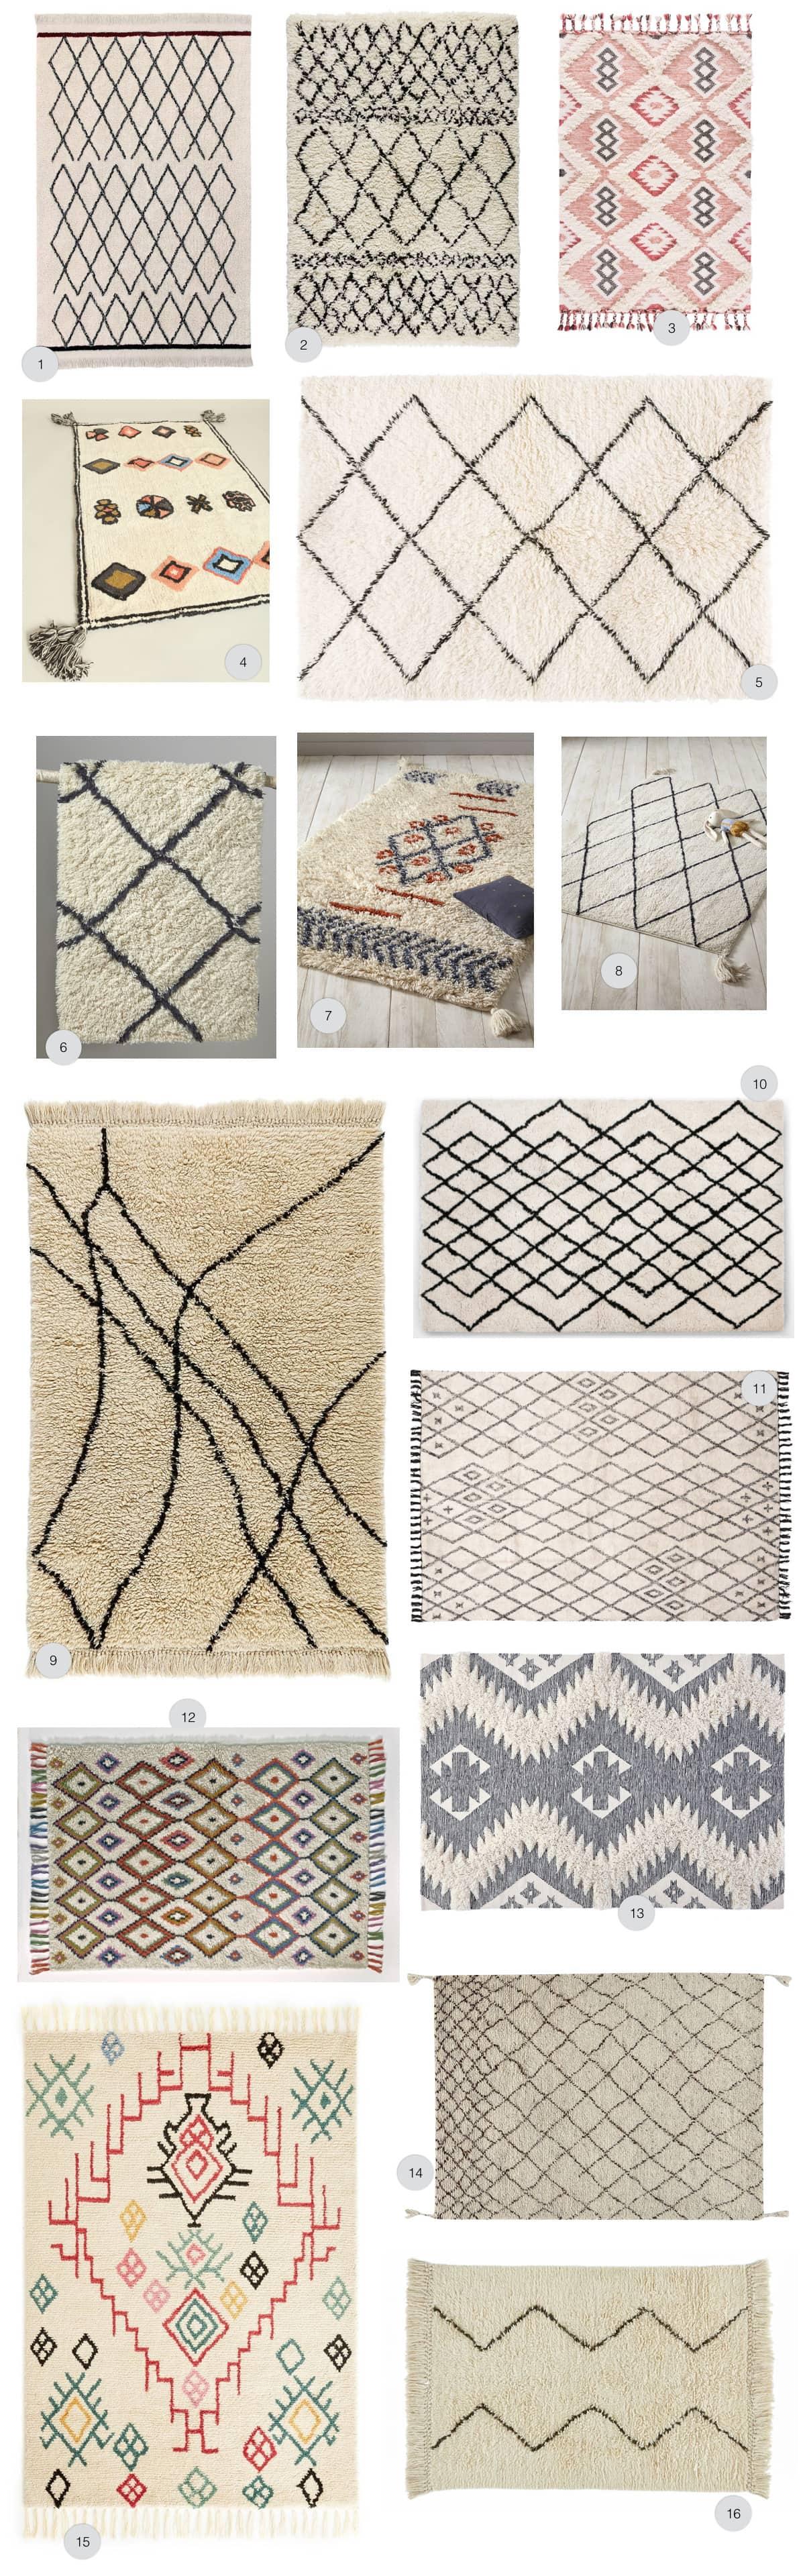 ou acheter un tapis style berbere en